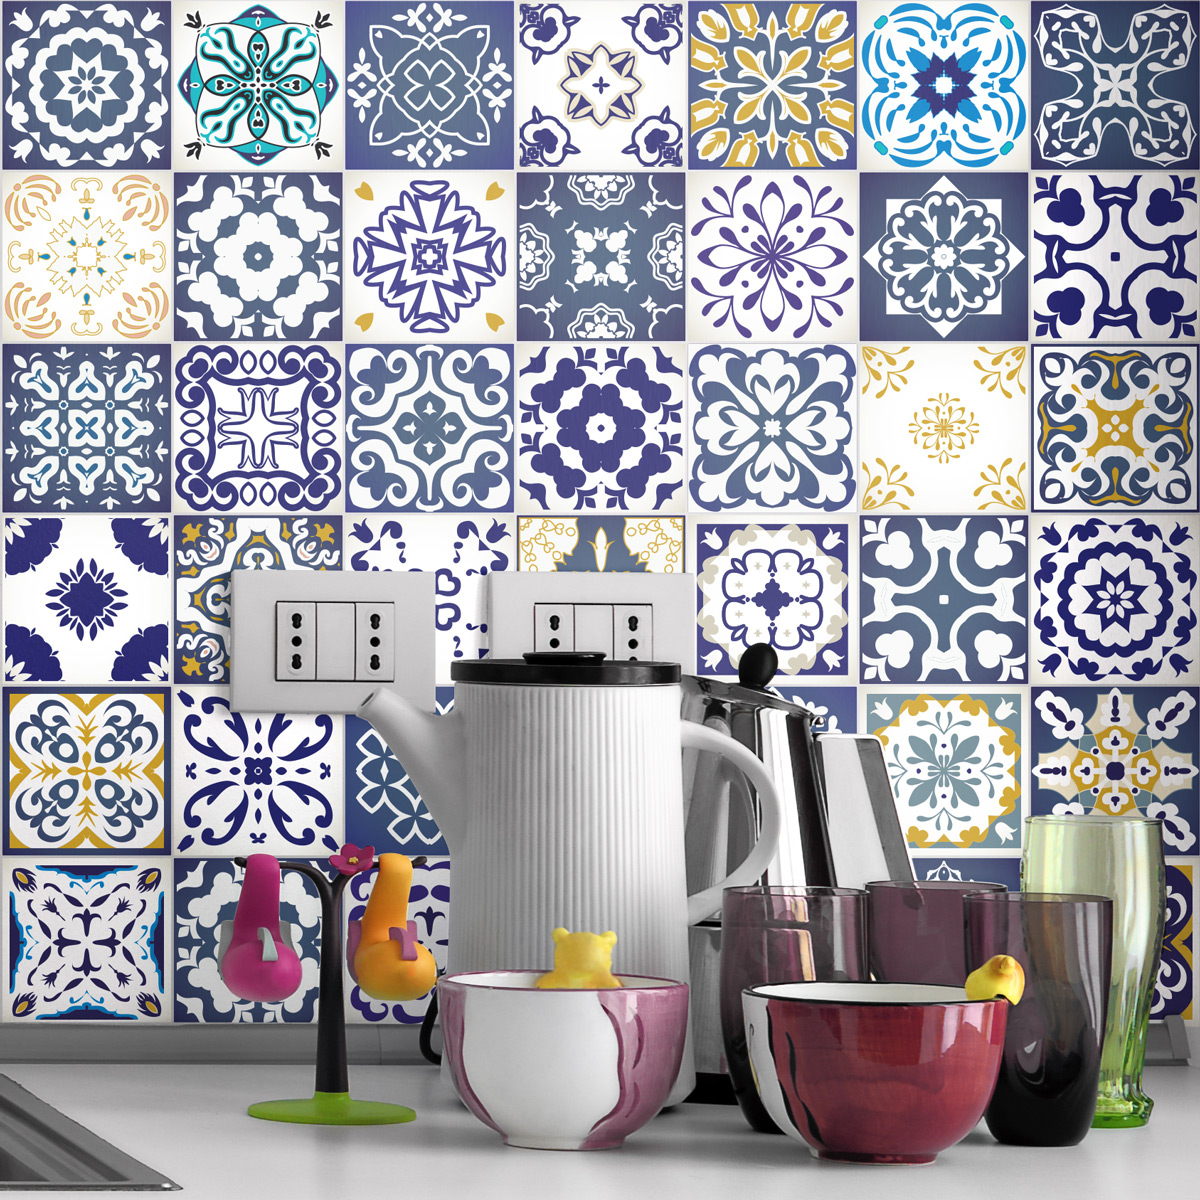 60 Stickers Carrelages Azulejos Cyprus Salle De Bain Et Wc Salle